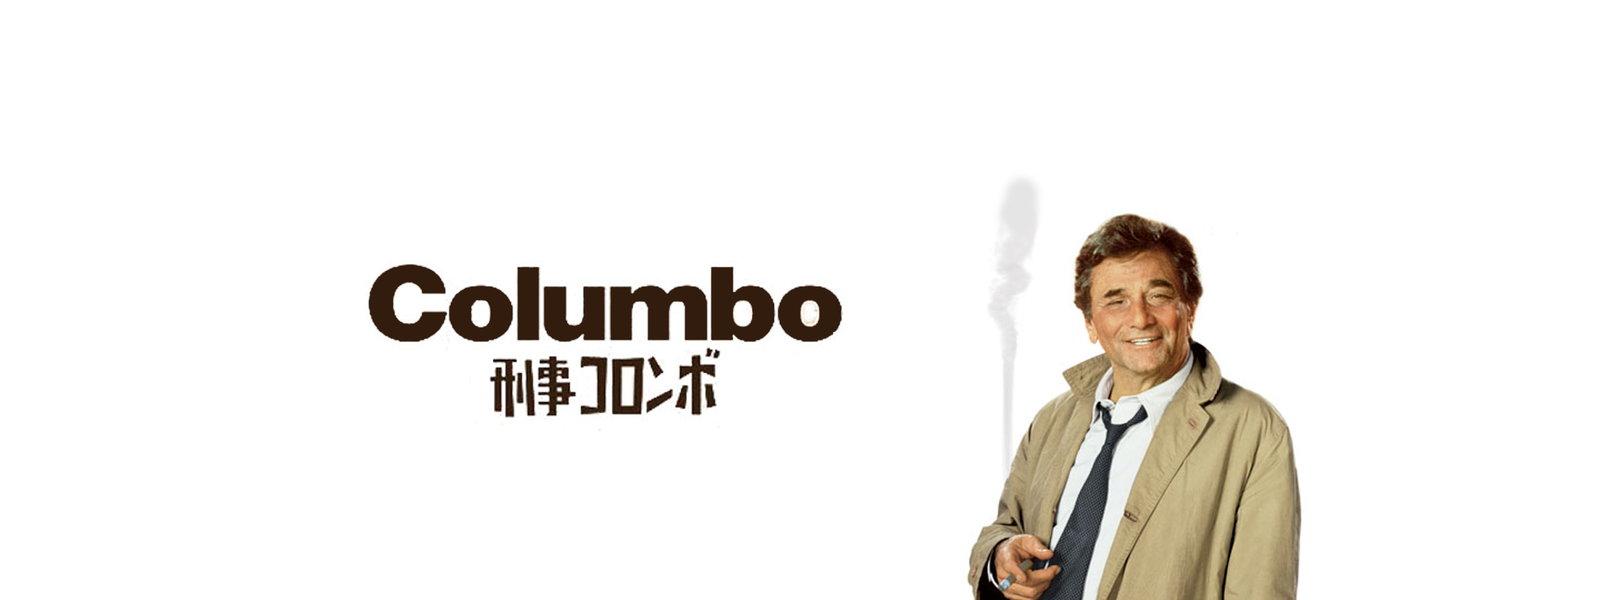 Columbo Bs